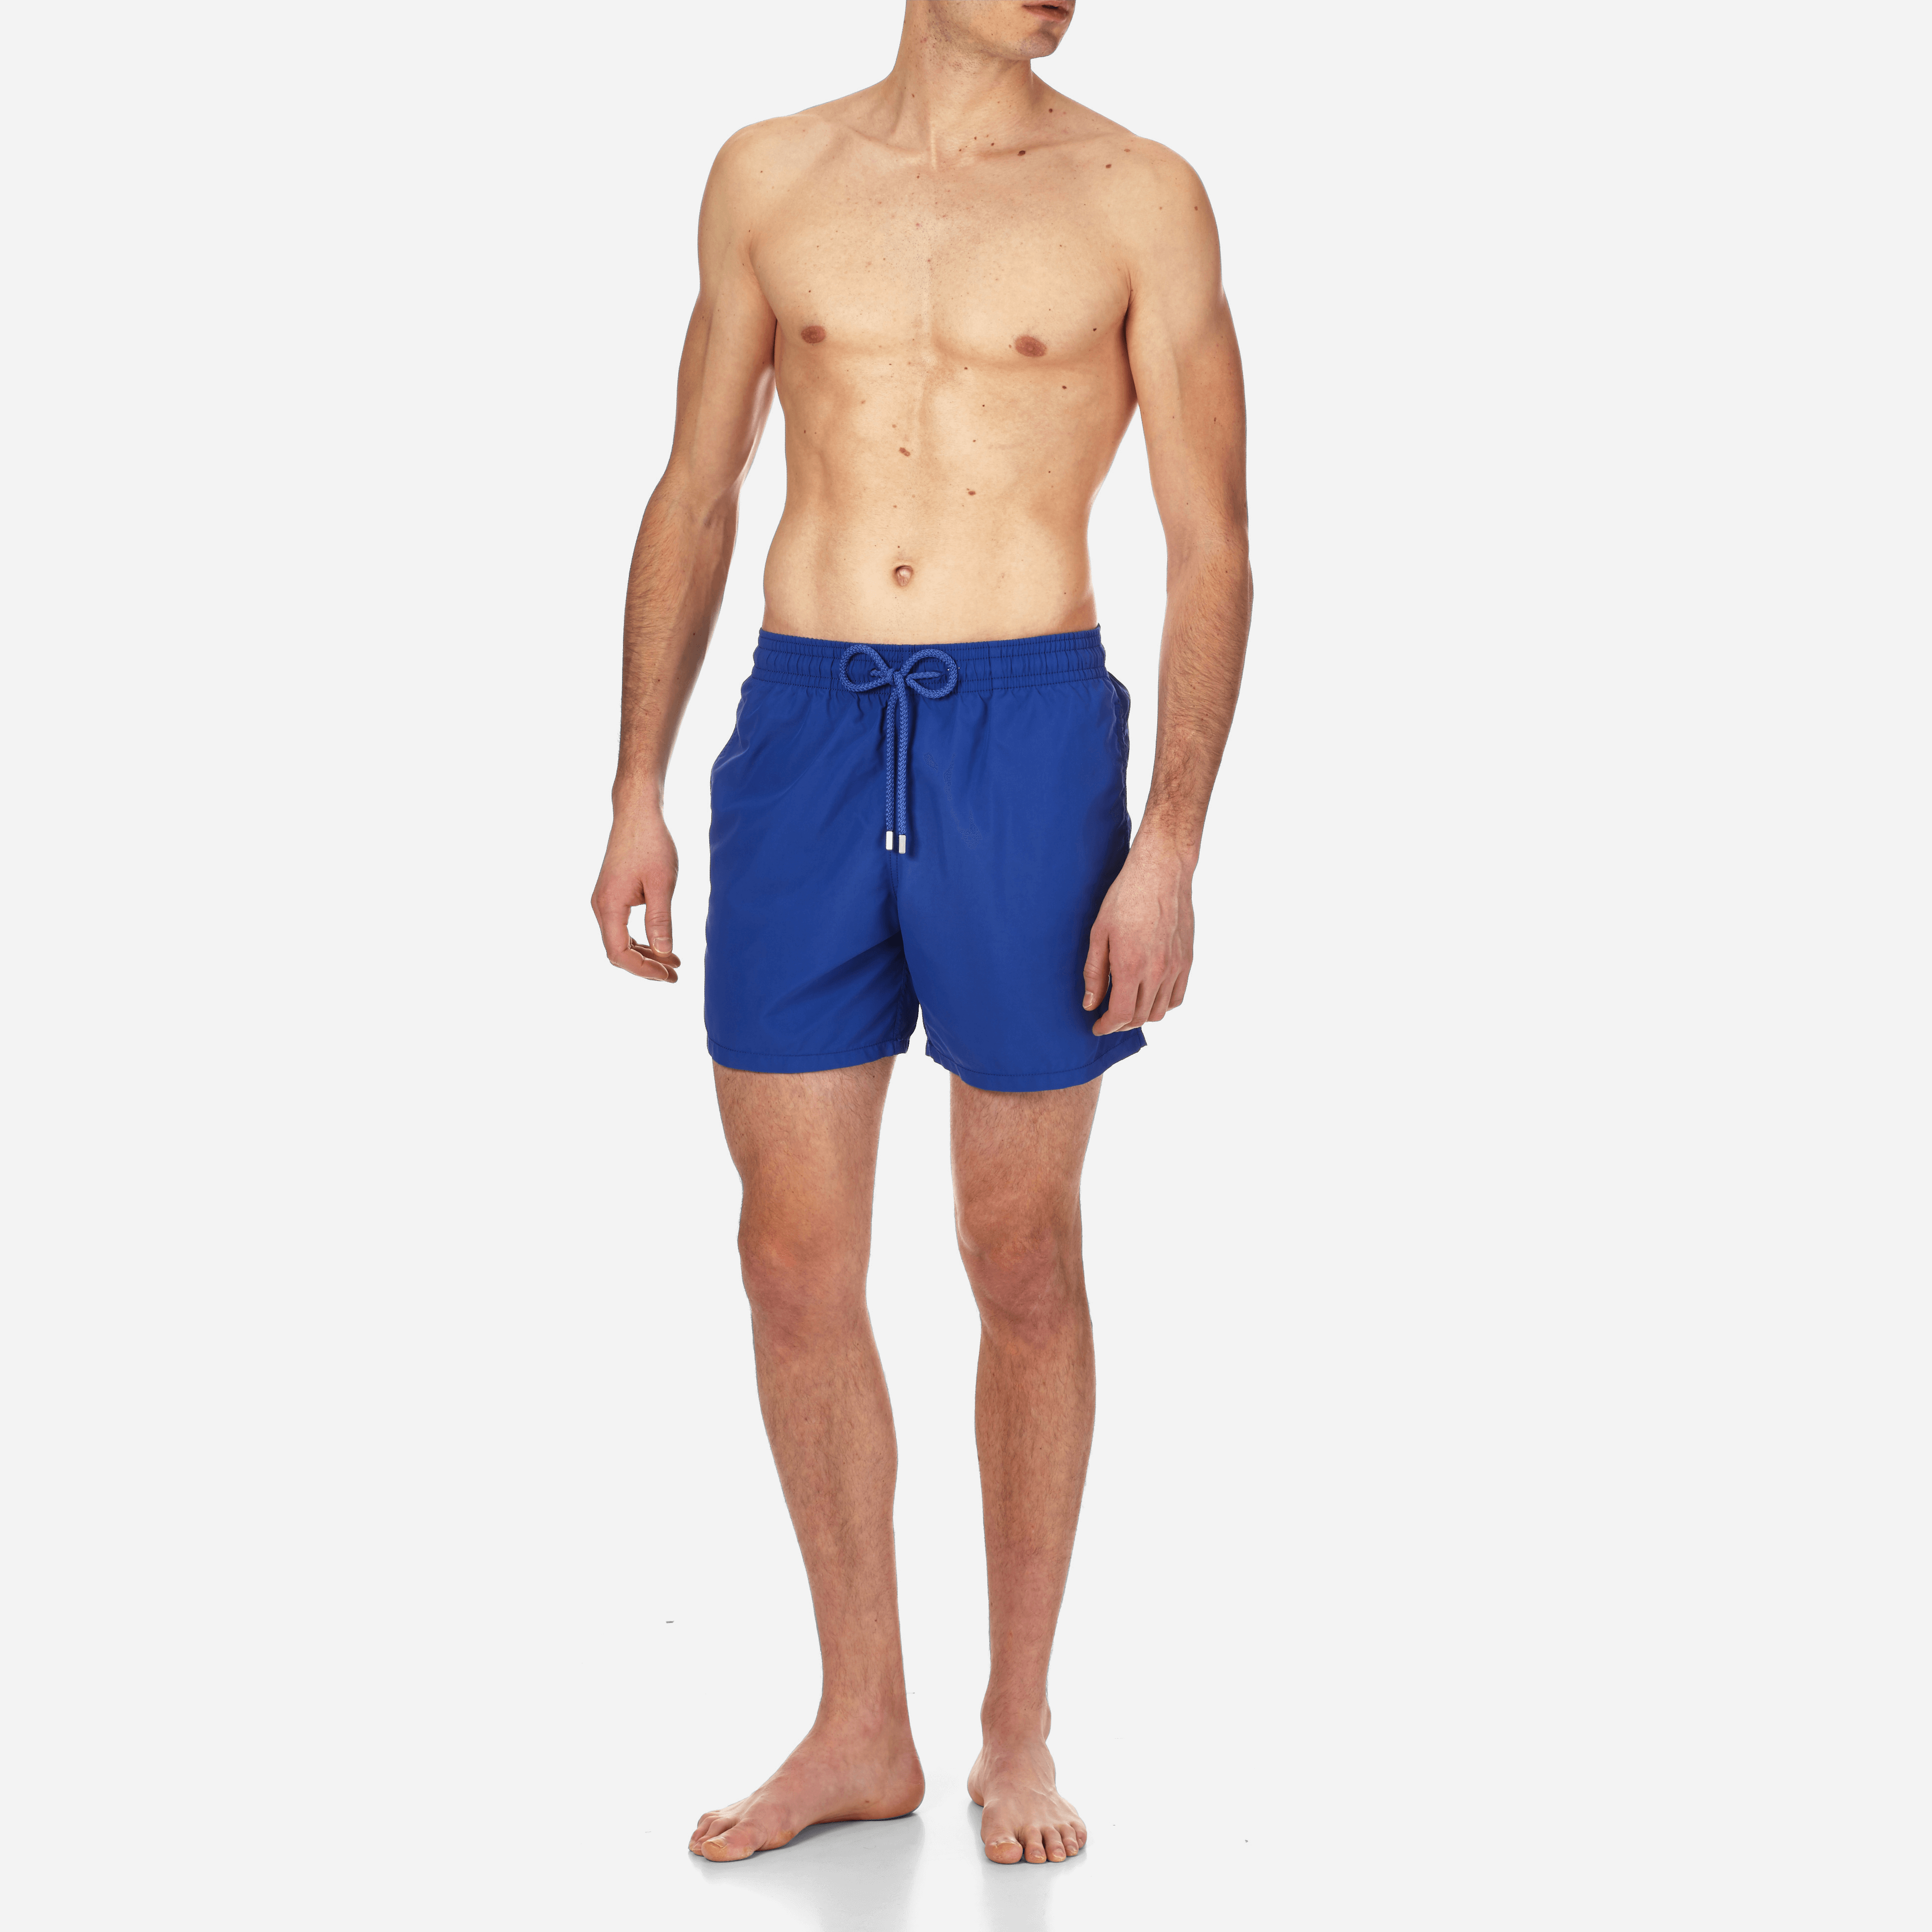 9e5416e916cce Men Short Solid - Smoking Tuxedo fitted Swim shorts, Navy frontworn |  Vilebrequin | Men's Swimwear | Luxe-Edit.com in 2019 | Tuxedo fitting, Swim  shorts, ...